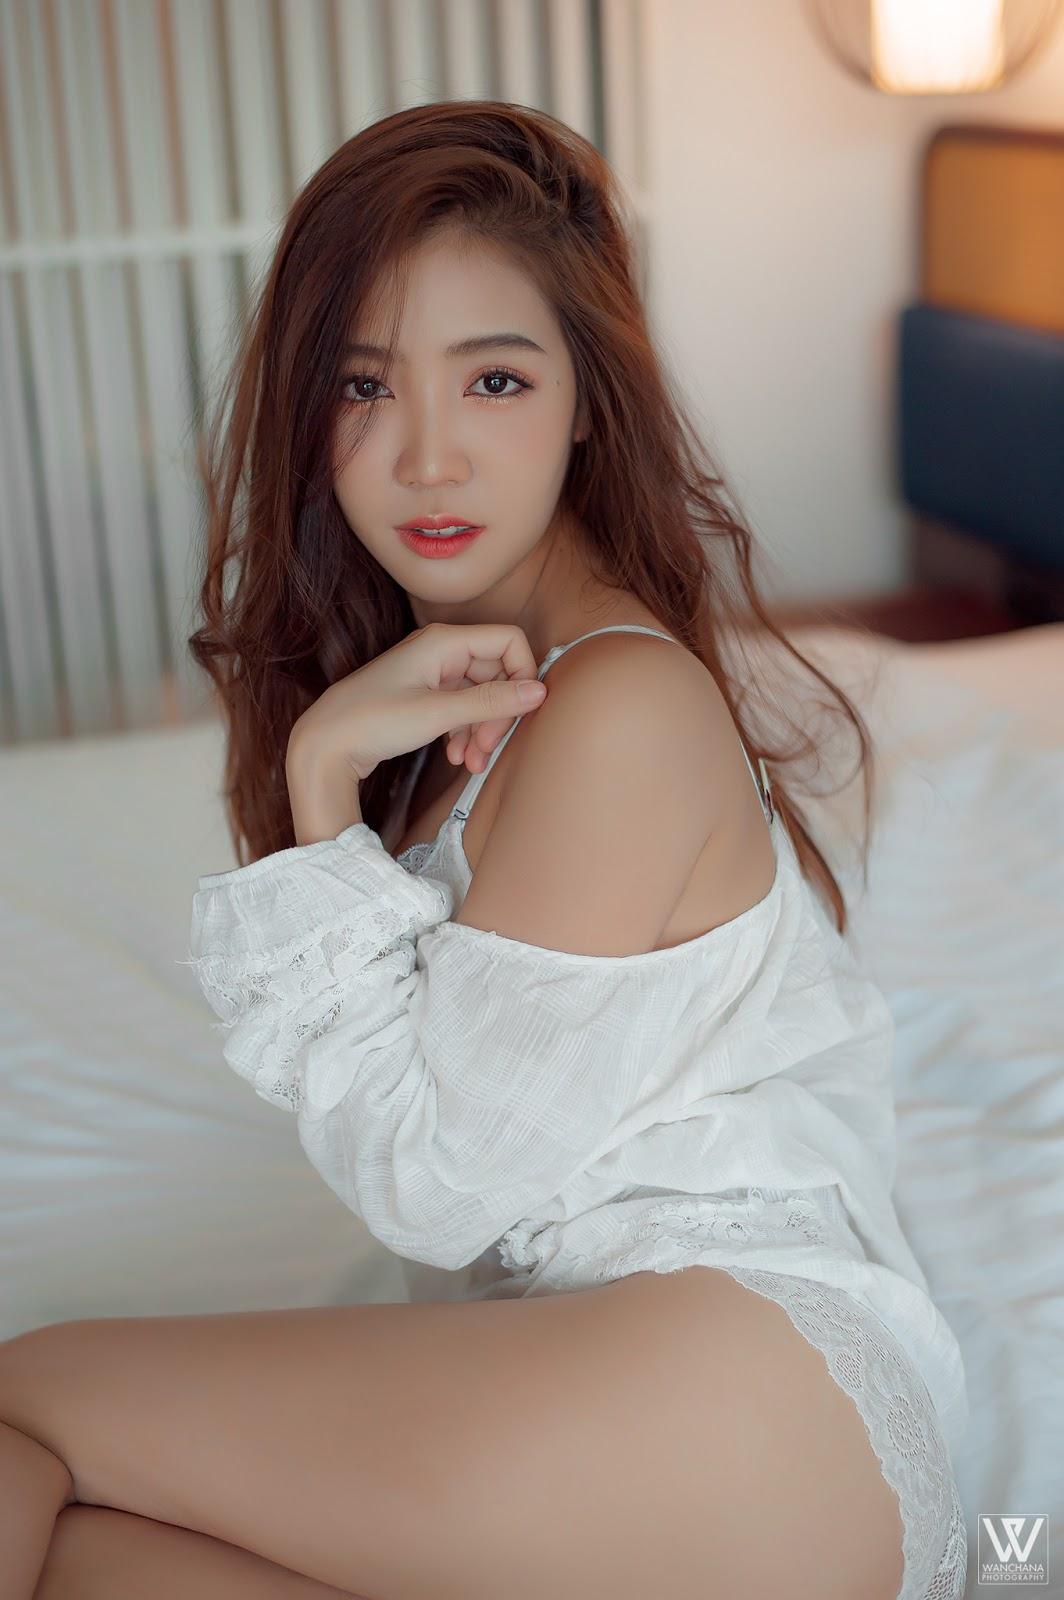 Thailand Beautyful Girl Pic No.244    Yoke Chonthicha